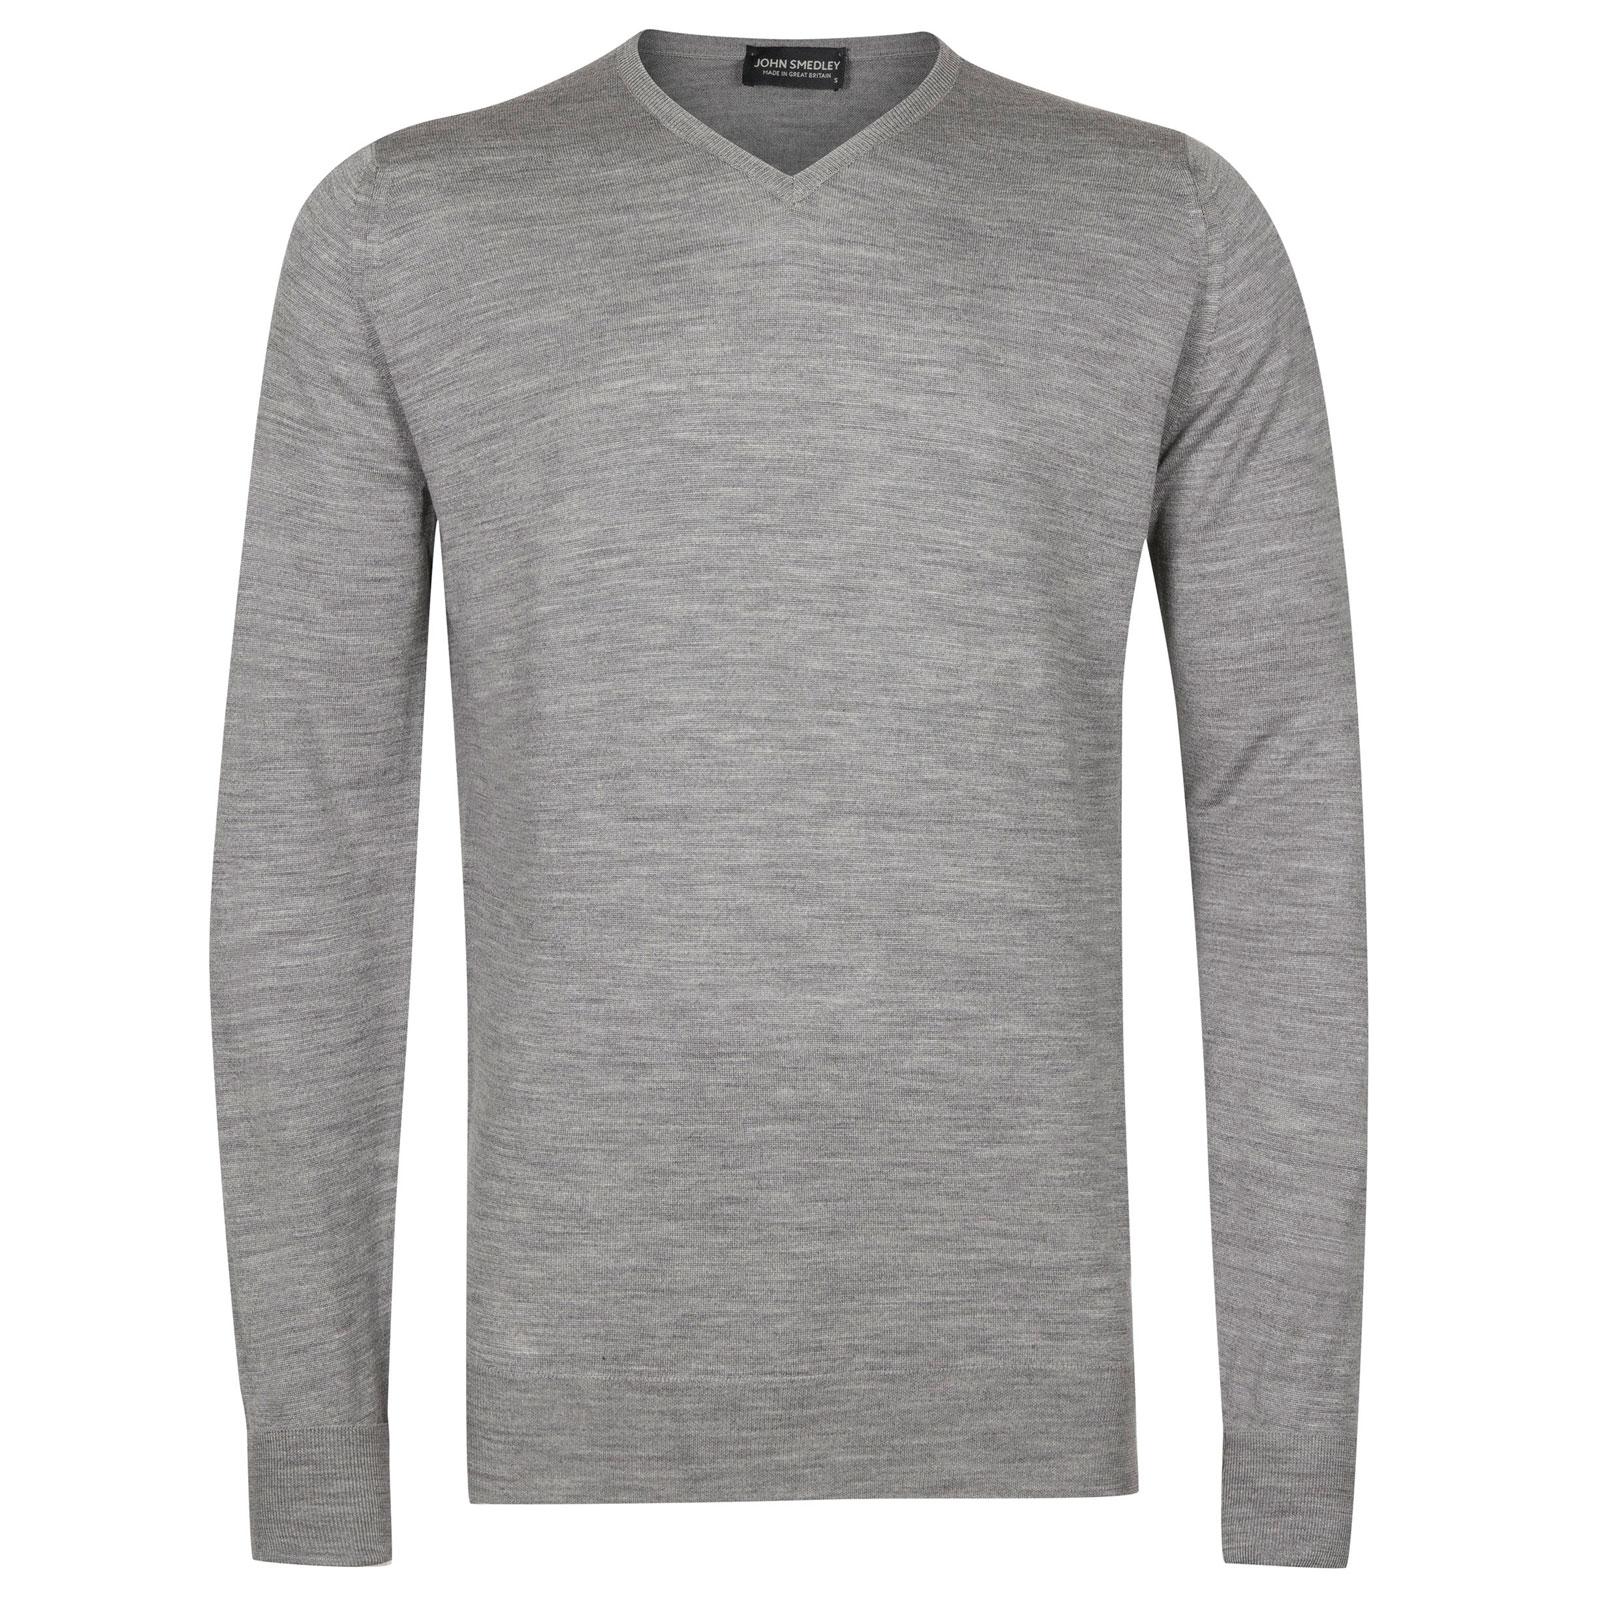 John Smedley shipton Merino Wool Pullover in Silver-L